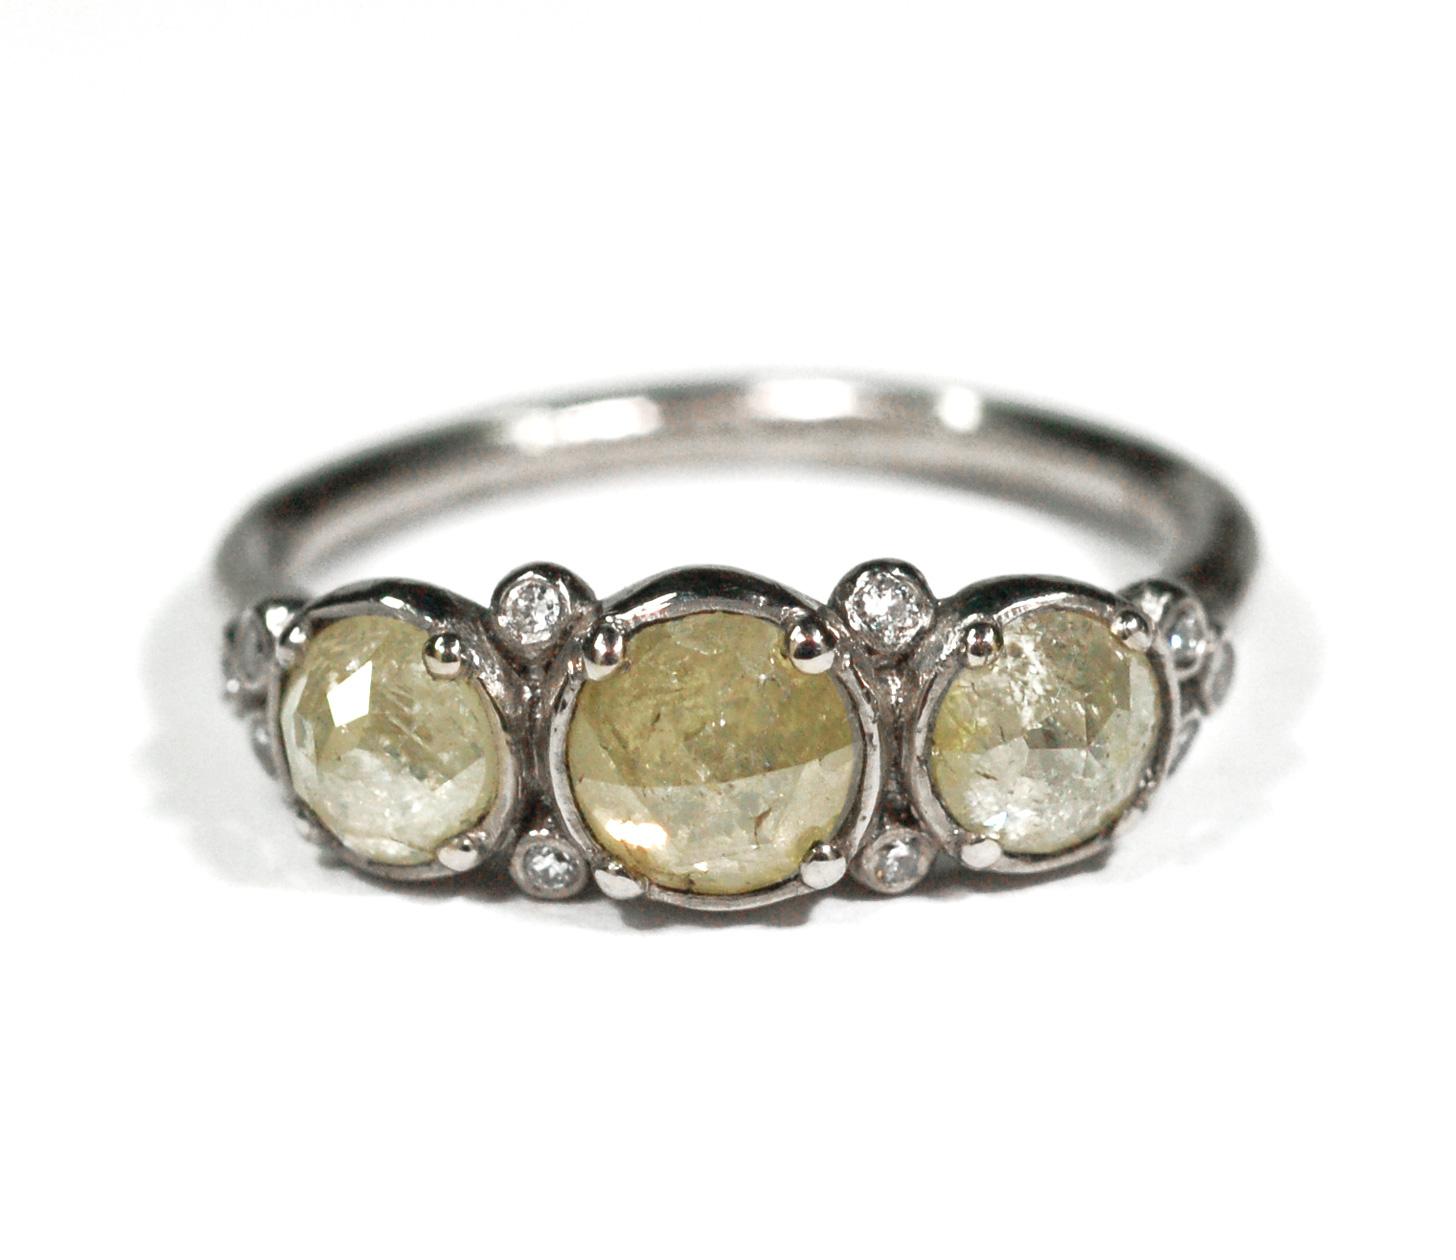 18ct-White-Gold-Arctic-Summer-RIng-Icey-Lemonade-Diamonds.jpg